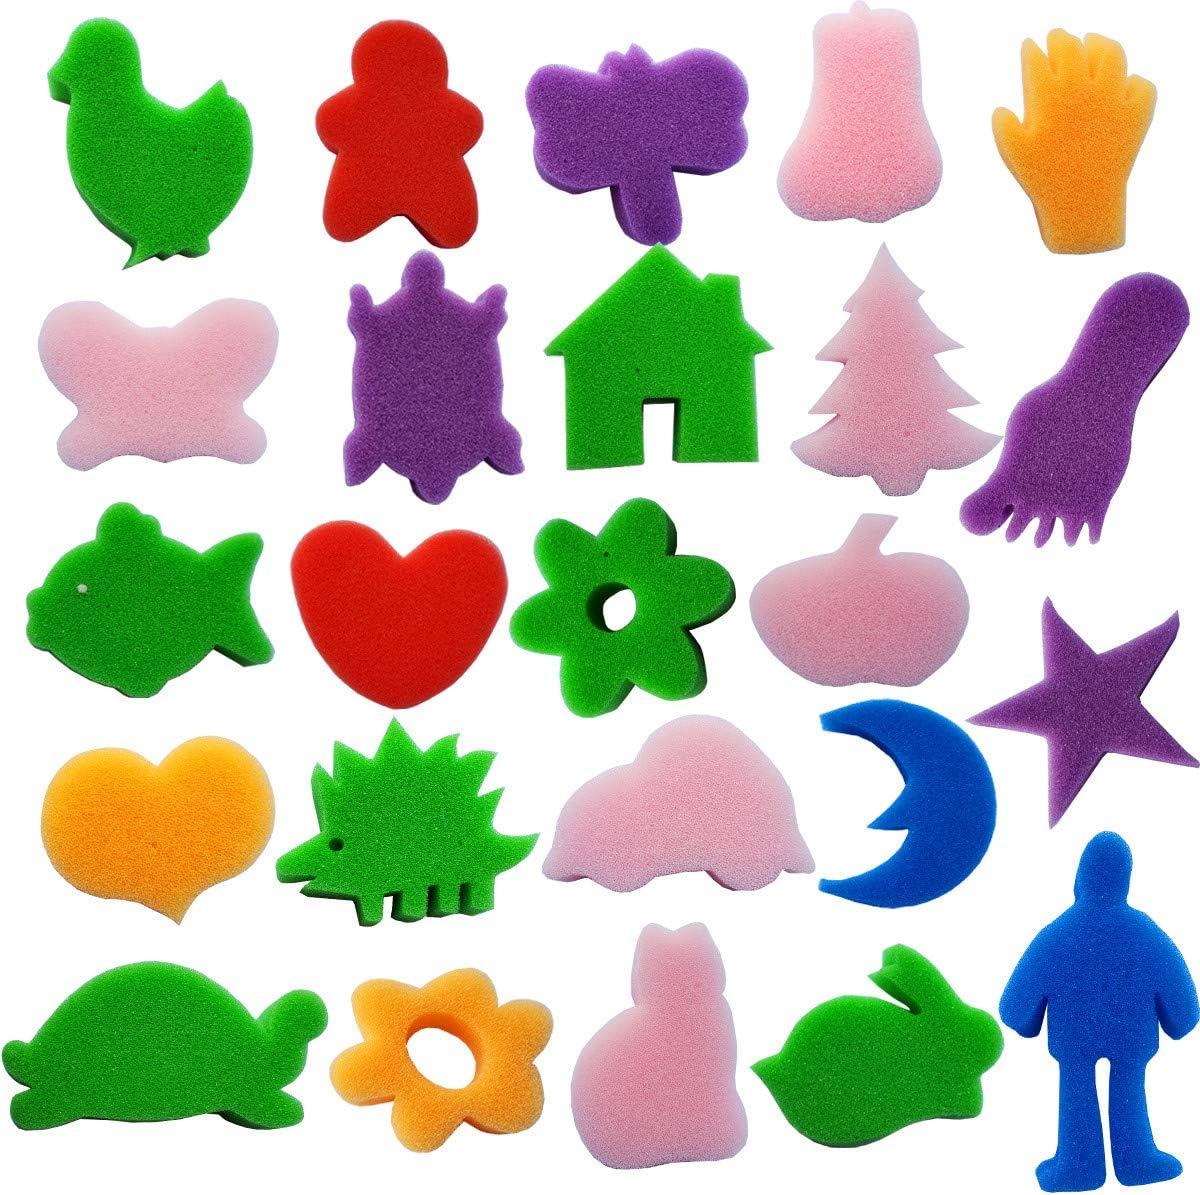 DIY Crafts Drawing Tools,Round Sponges,Color Randomly Kids Art Tool Kits Himeeu 53 Pcs Paint Sponge Brush Sets